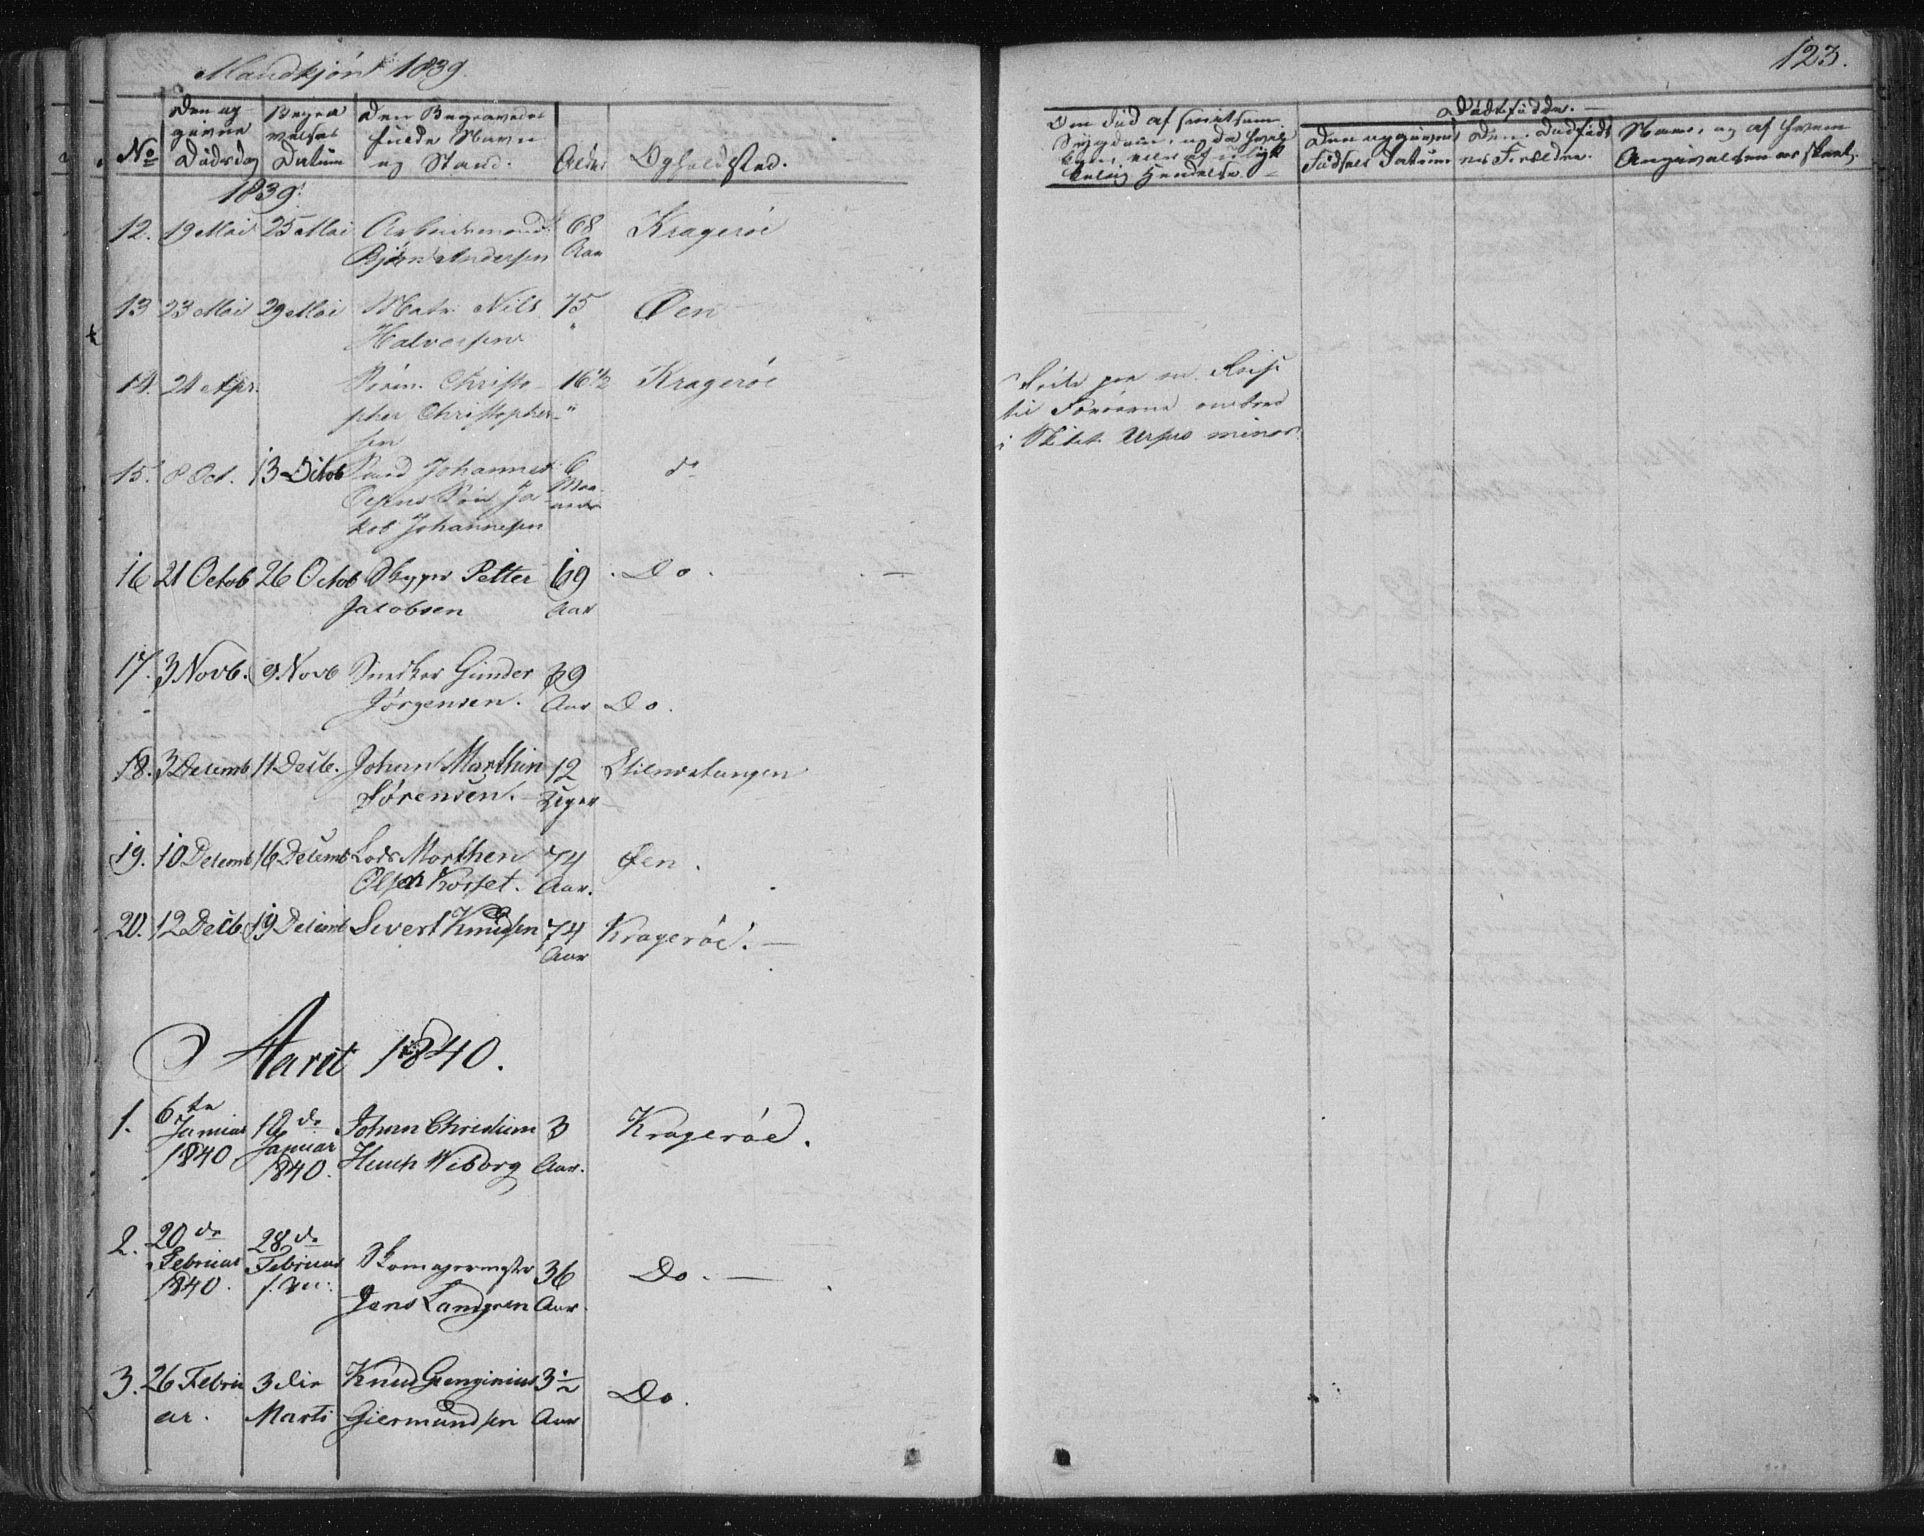 SAKO, Kragerø kirkebøker, F/Fa/L0005: Ministerialbok nr. 5, 1832-1847, s. 123